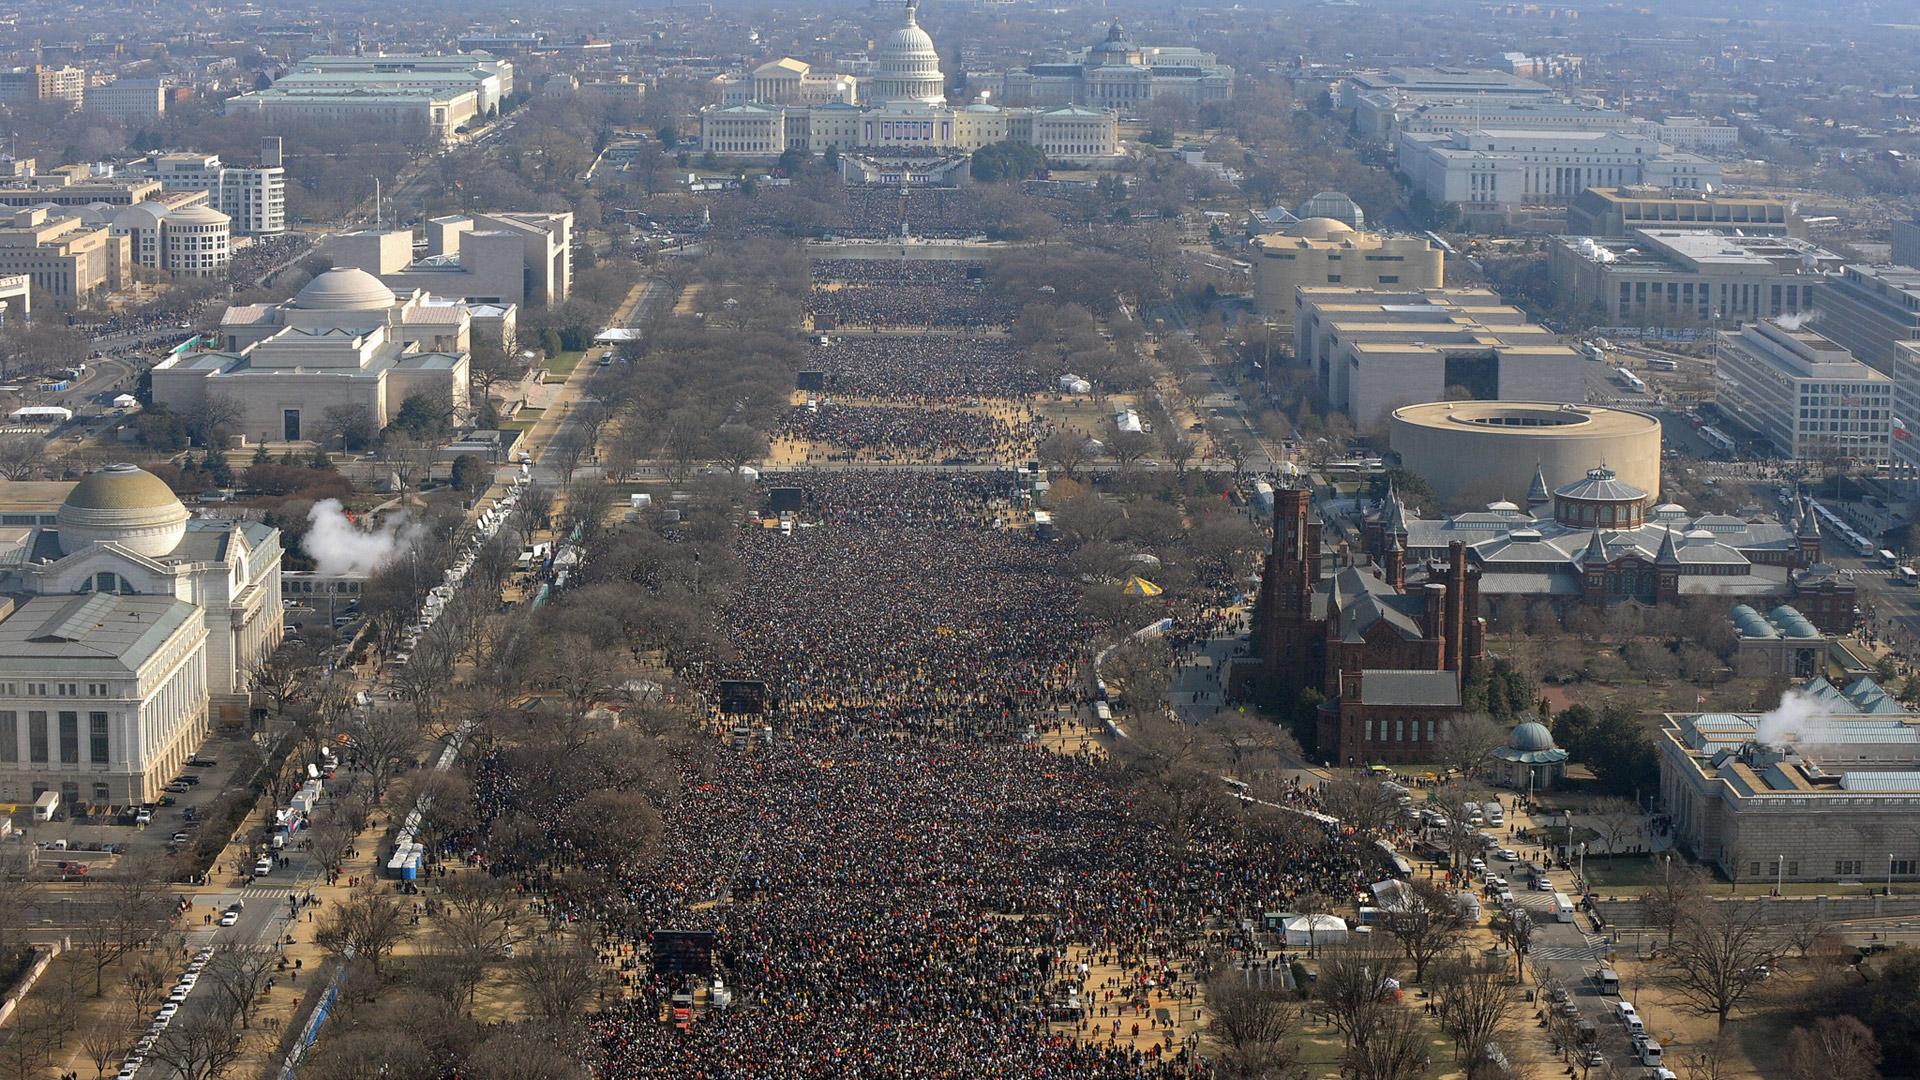 Barack Obama's inauguration 2009